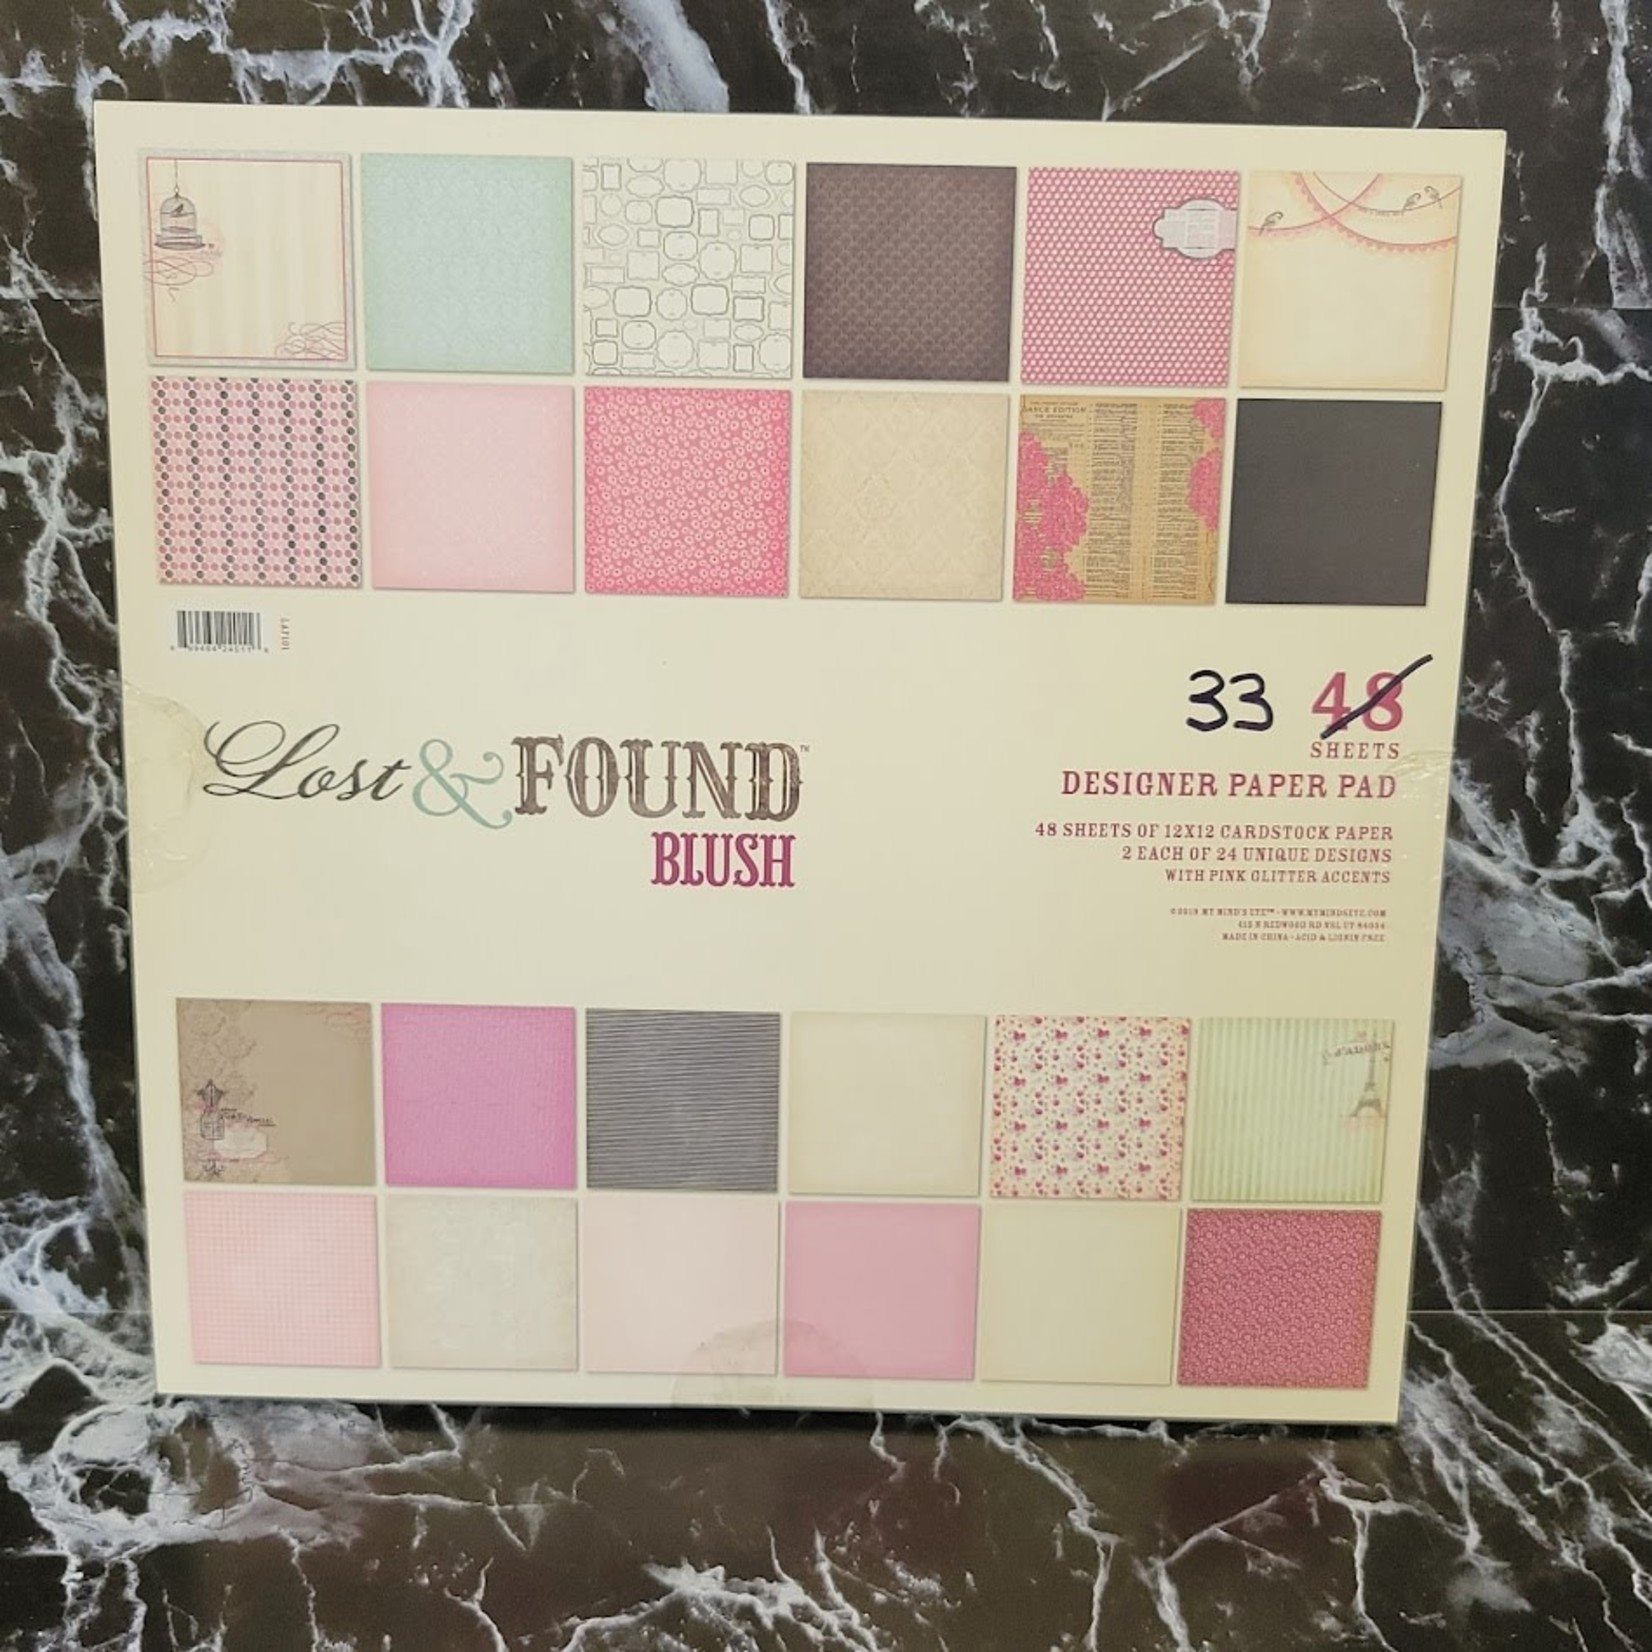 Lost & Found Designer Paper Pad - 33 12 x 12 sheets